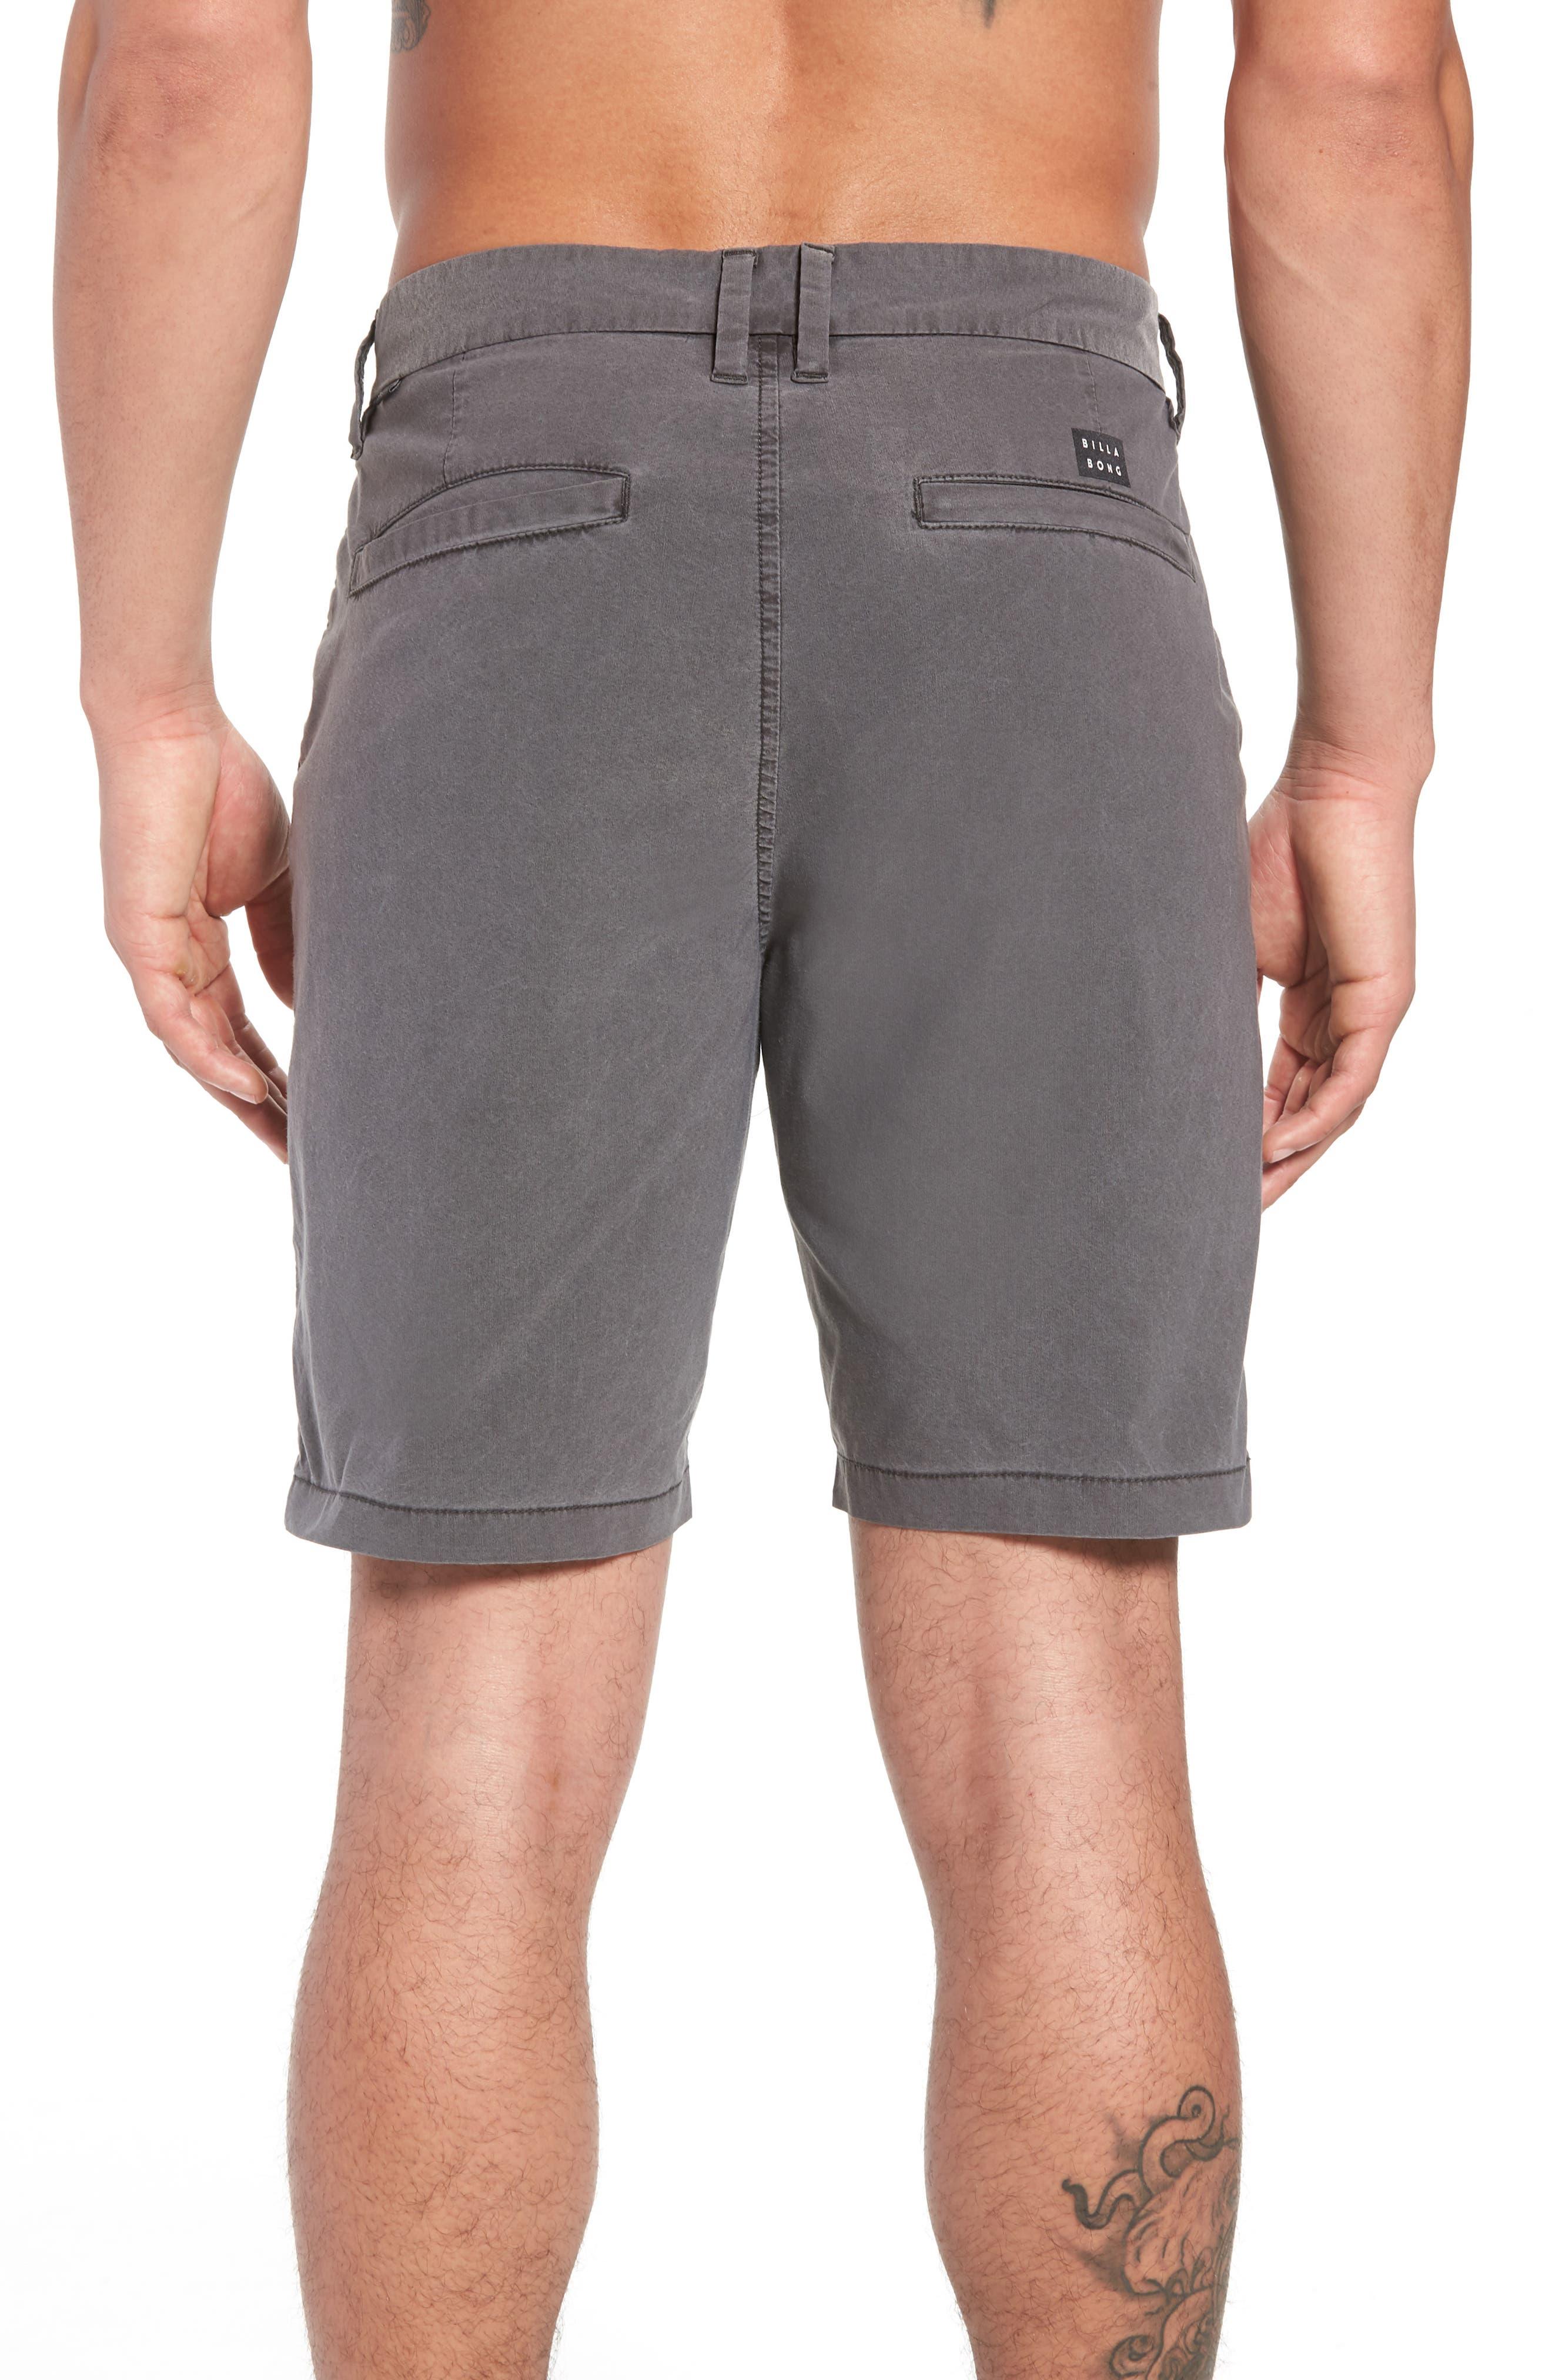 New Order X Overdye Hybrid Shorts,                             Alternate thumbnail 2, color,                             001